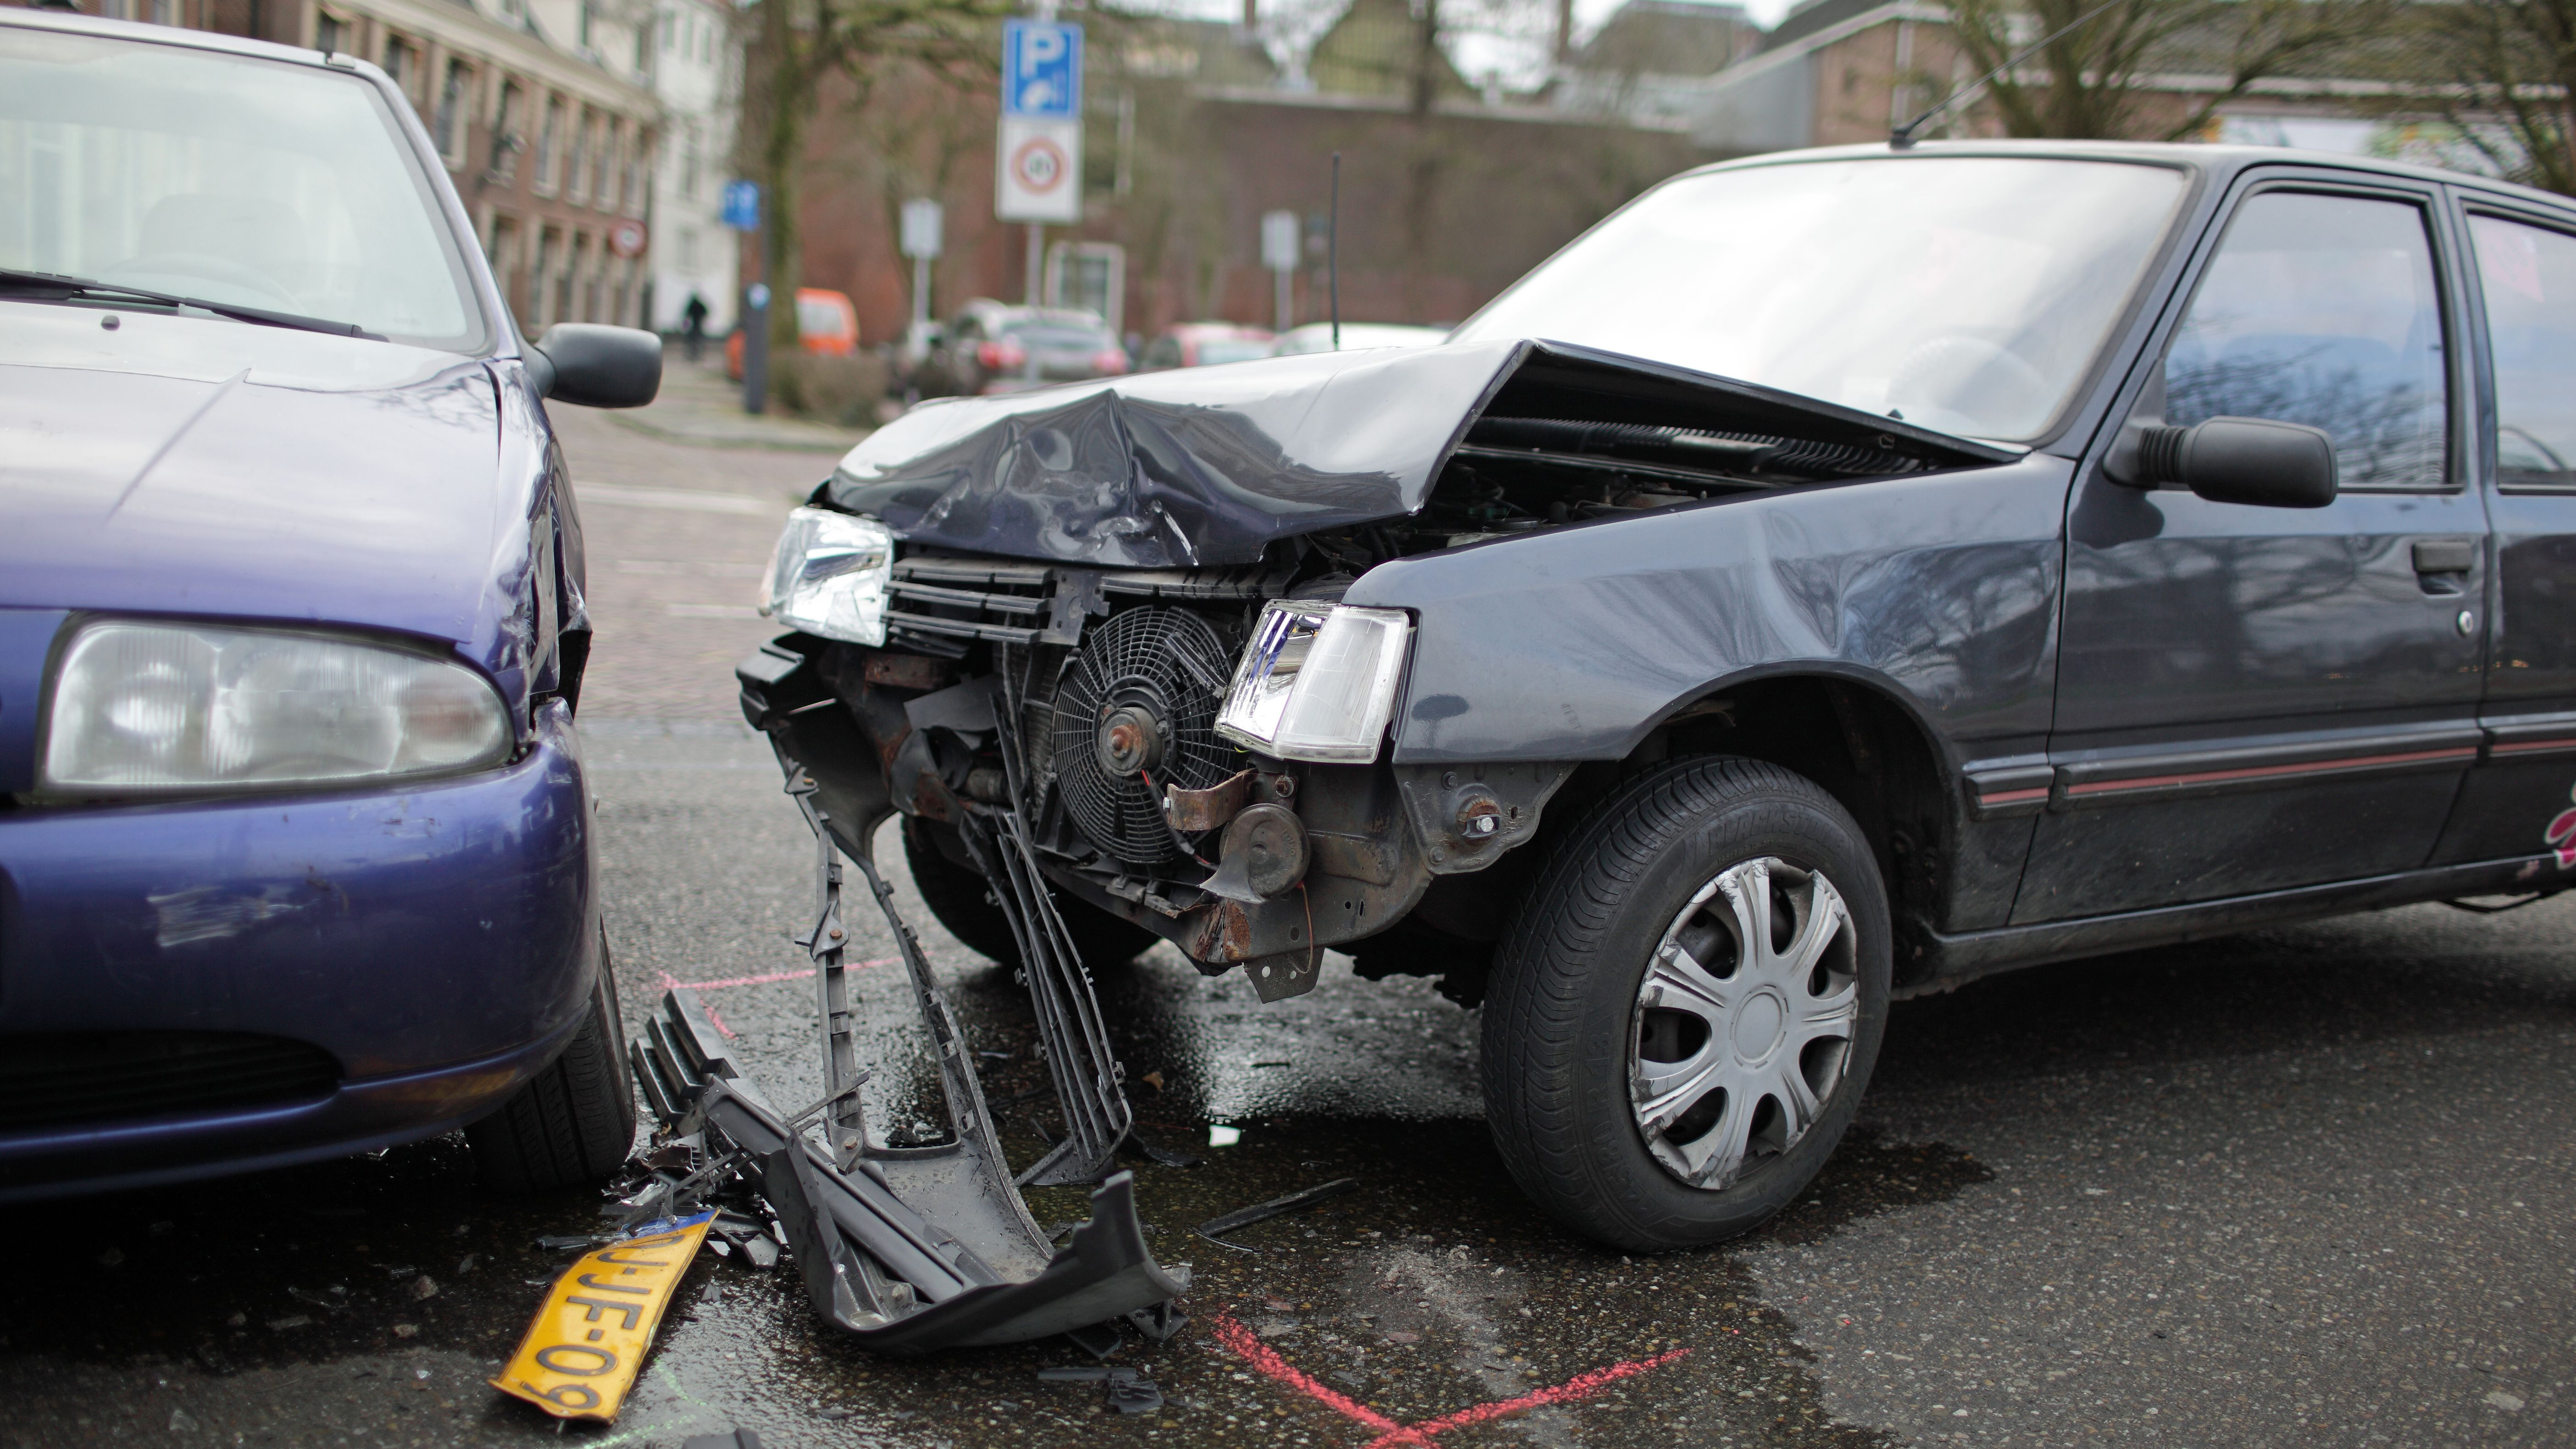 Loss of Use Car Rental Insurance